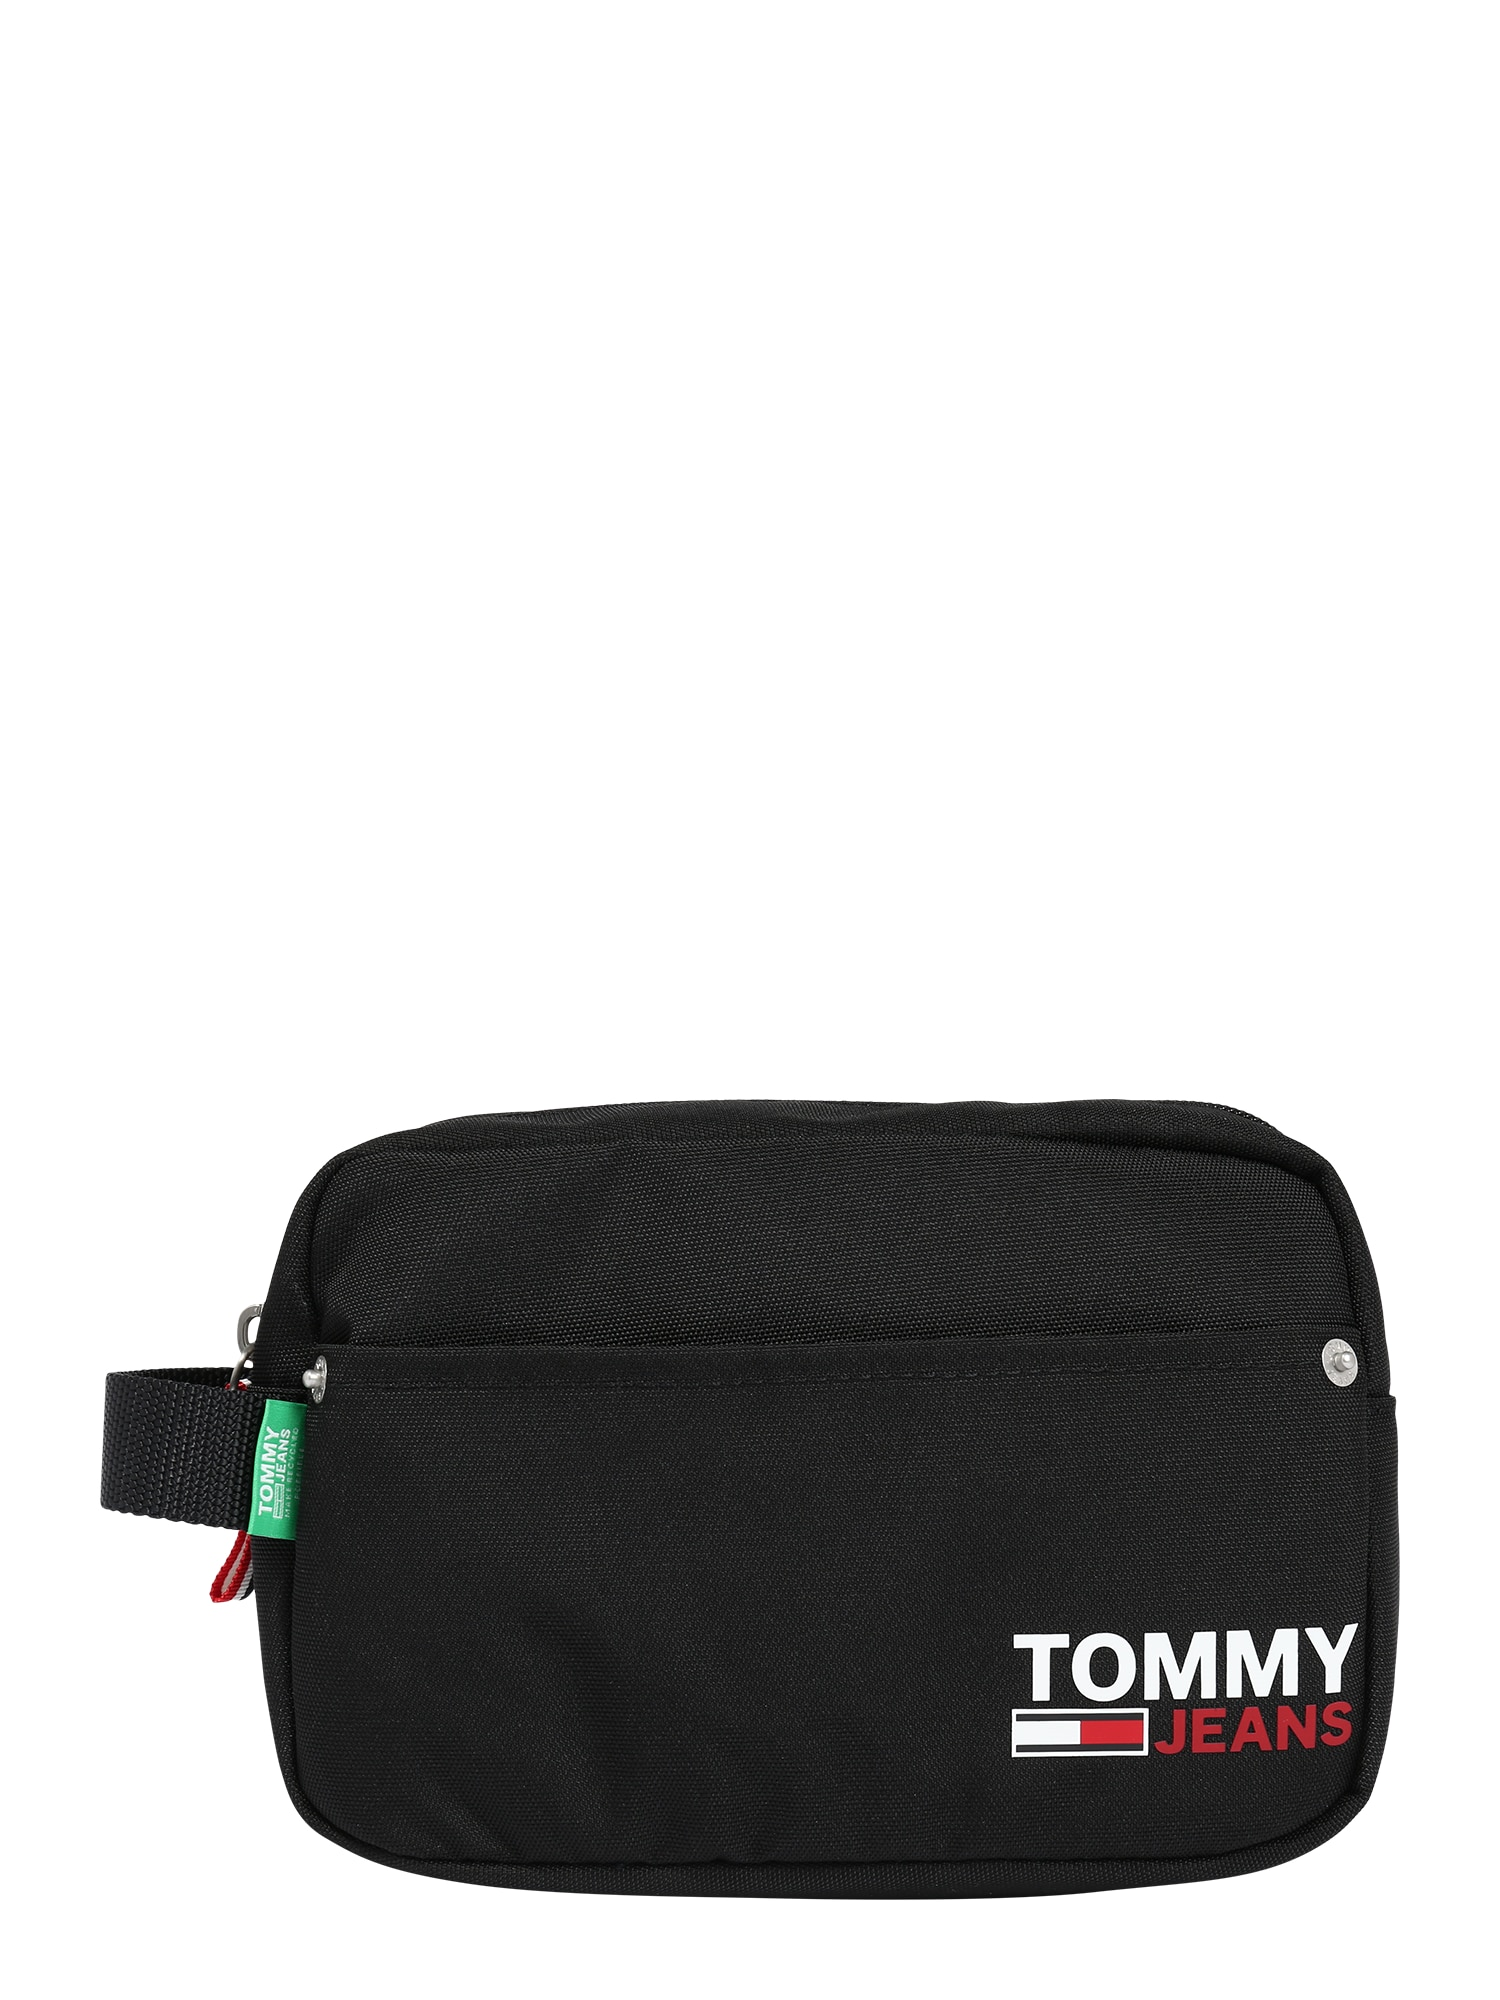 Tommy Jeans Tuoleto reikmenų krepšys juoda / balta / raudona